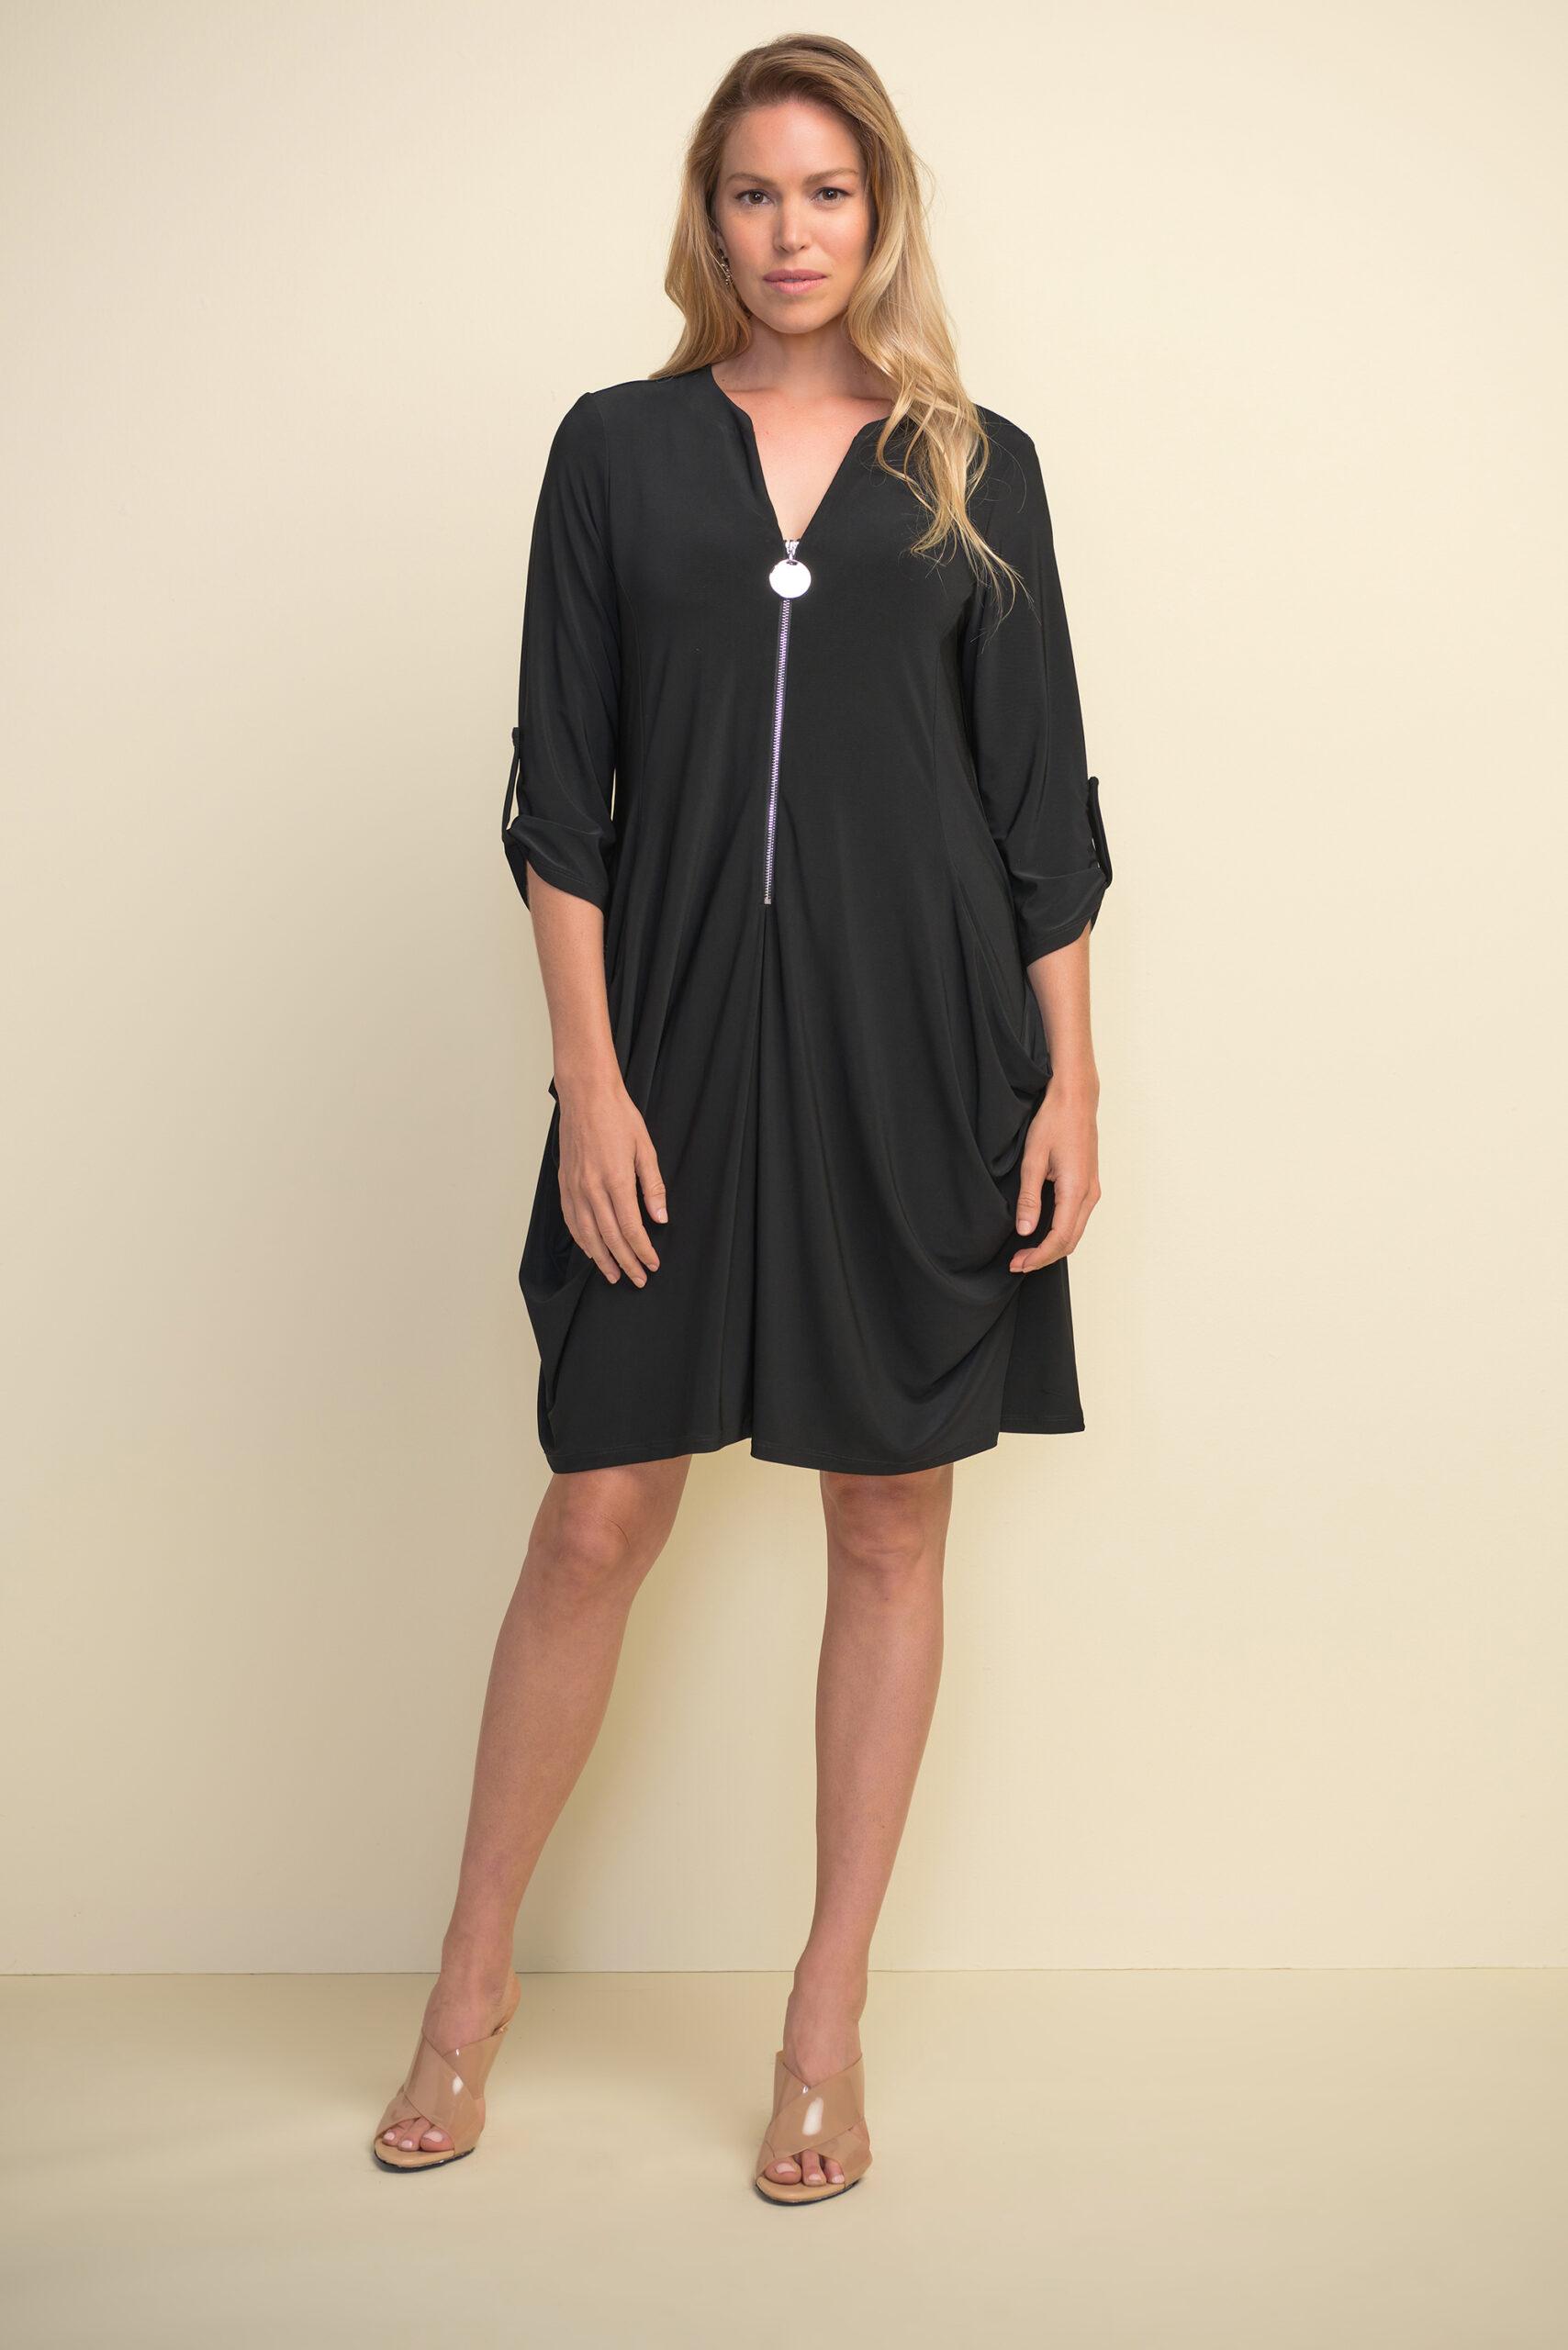 Joseph Ribkoff black dress style #211238